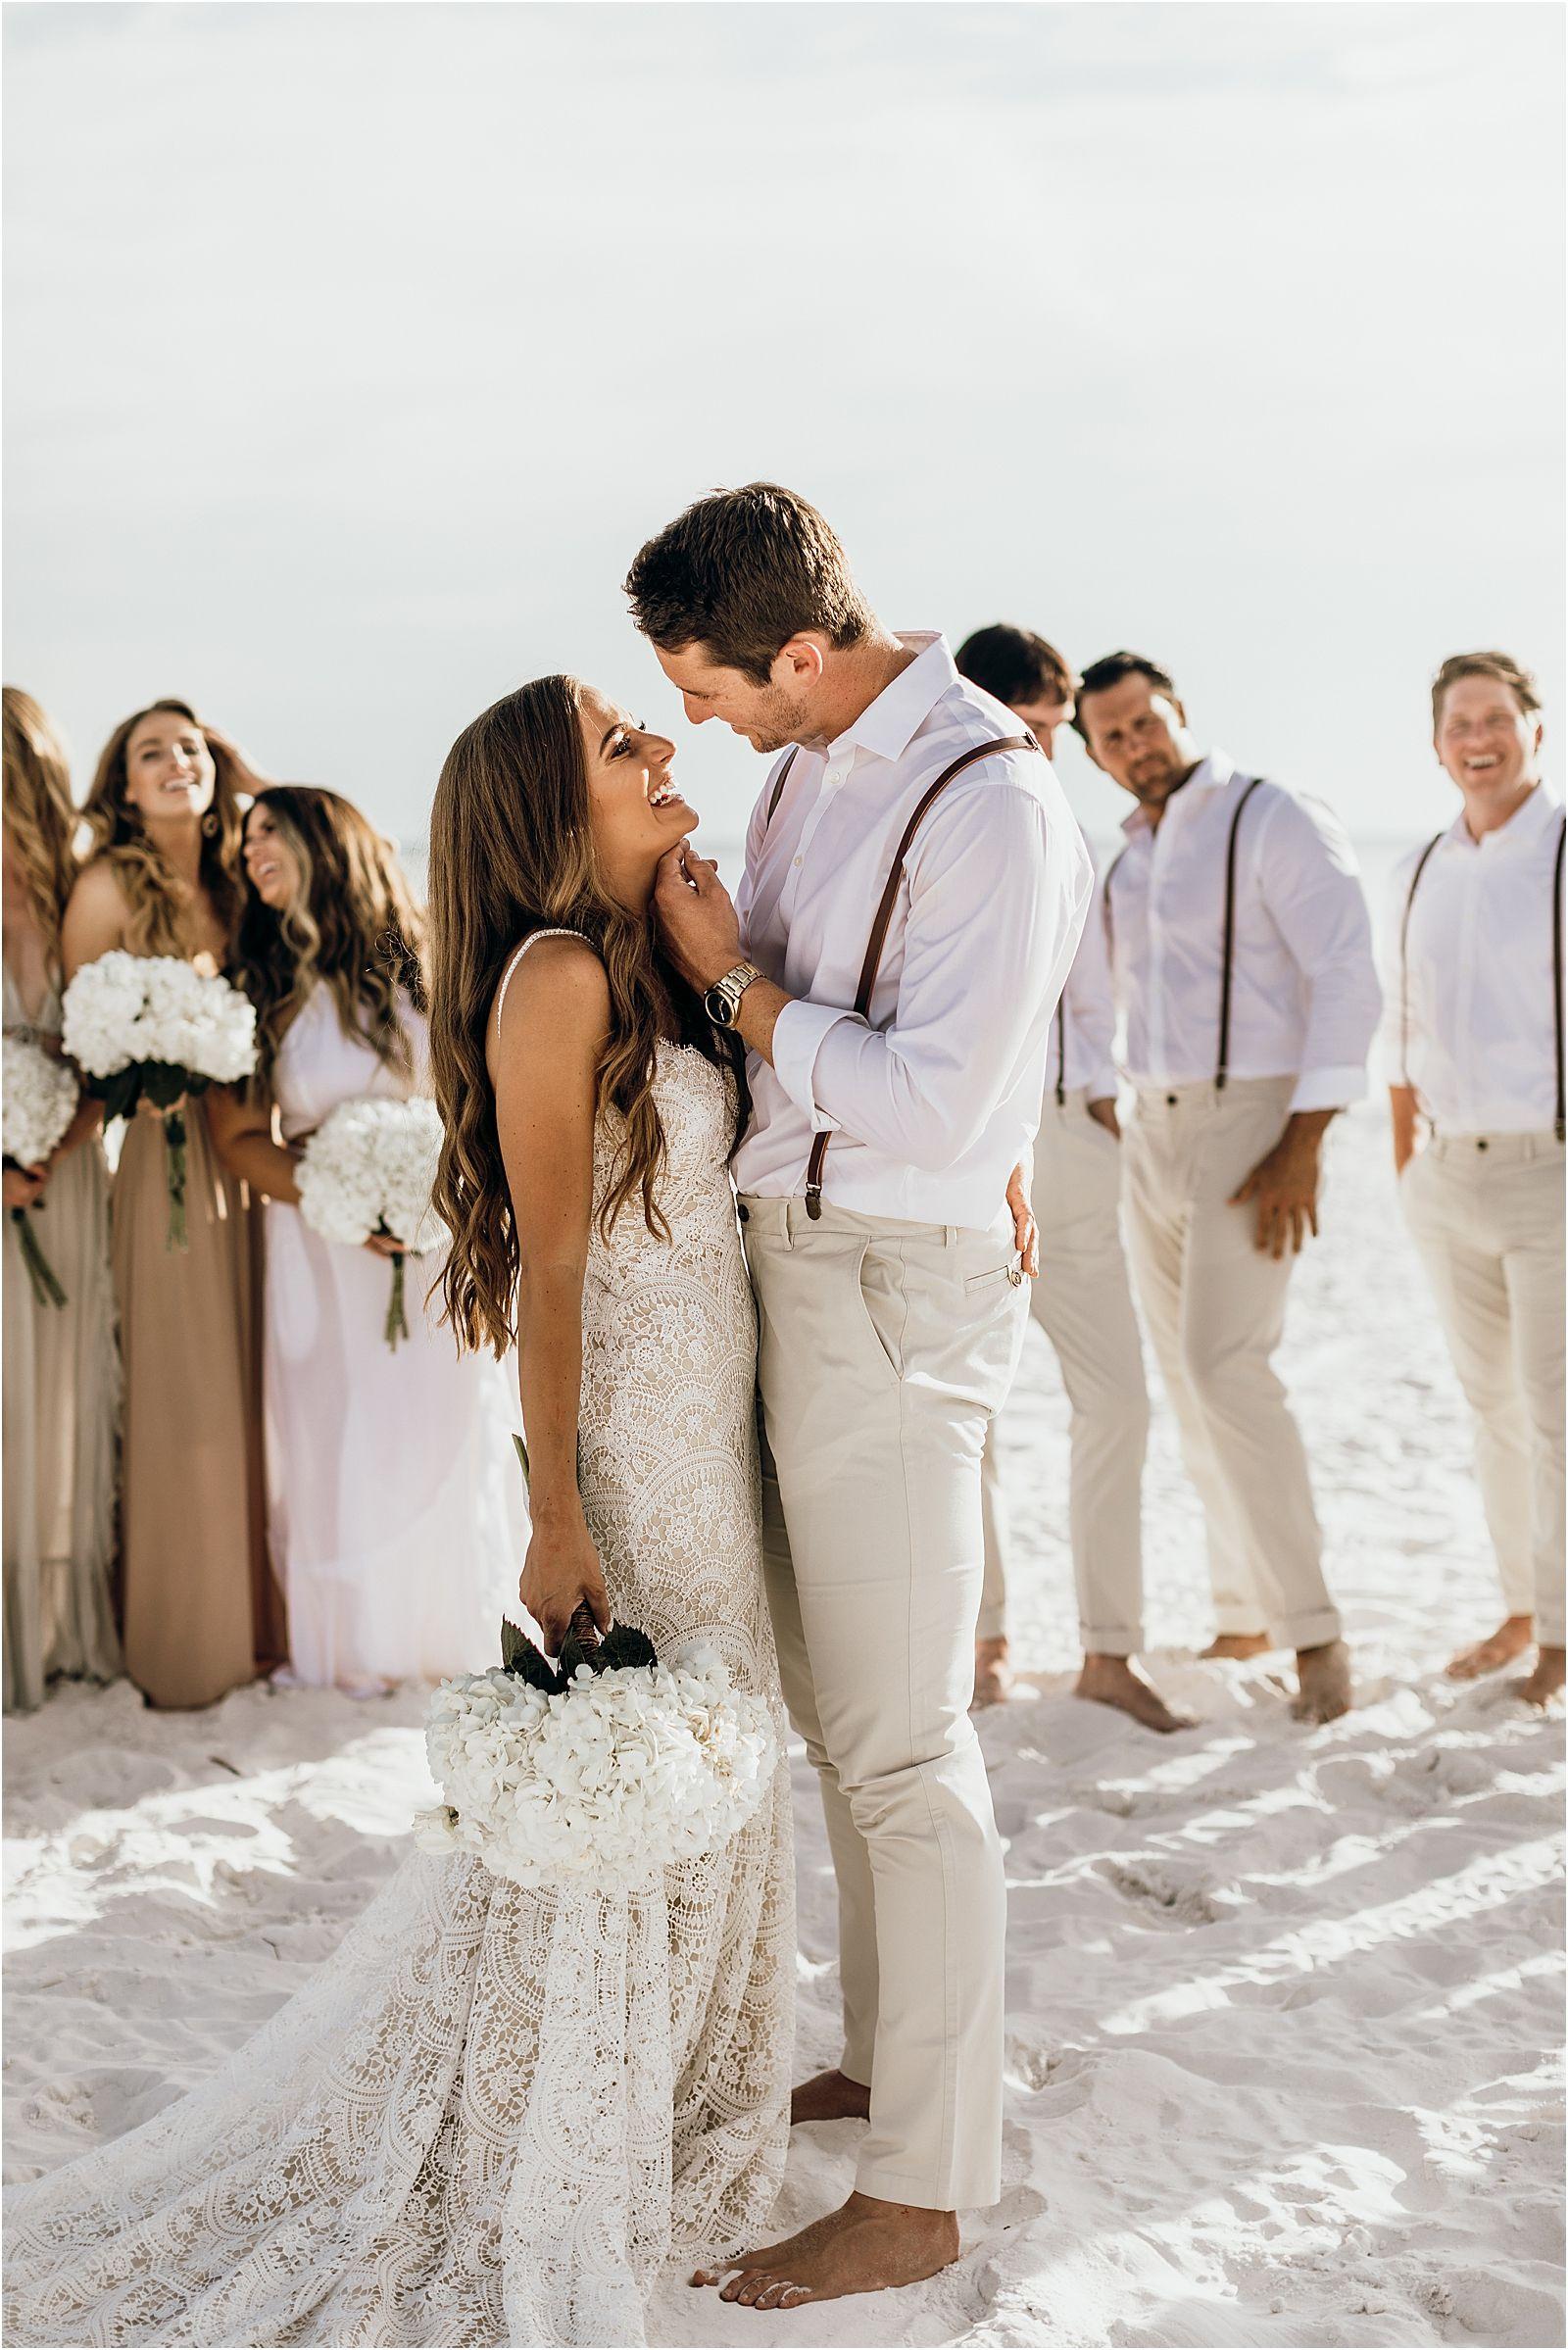 Photo of Lauren + Jon | Stones Throw Miramar, Florida Beach Destination Wedding | Love, Anneliese Photography – loveanneliese.com